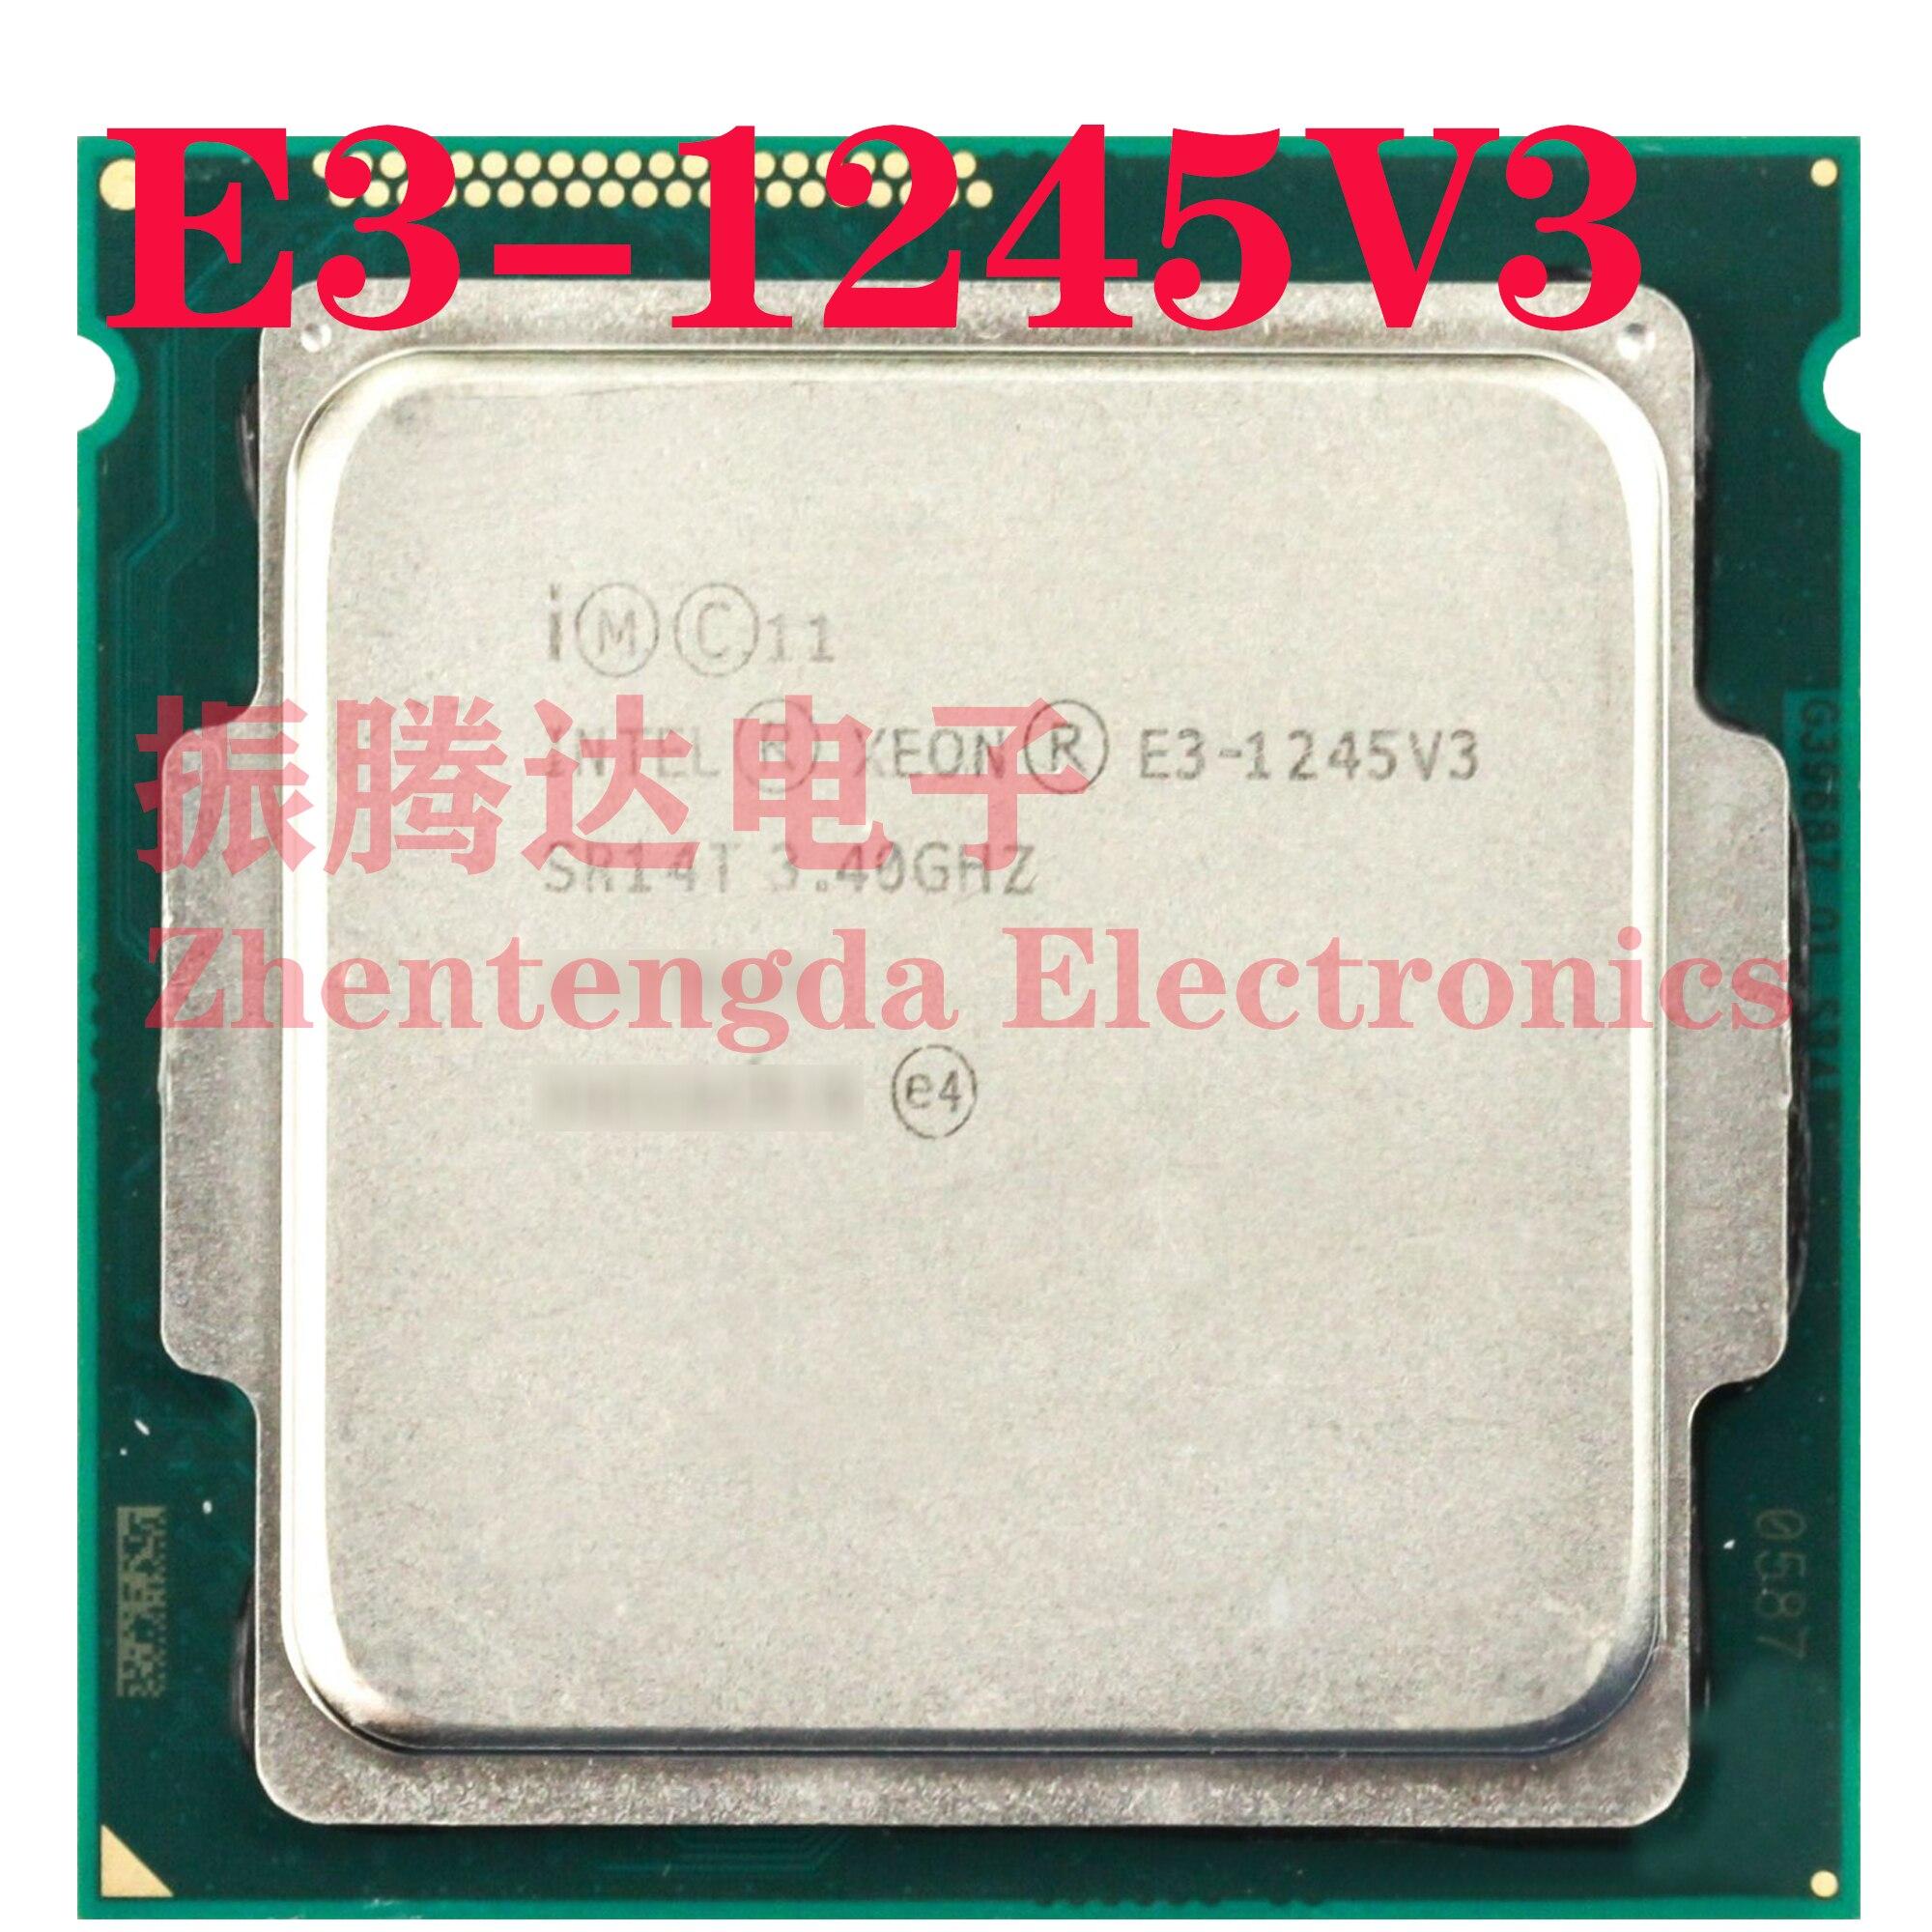 Intel Xeon E3-1245 v3 3.4GHz 8MB 4 Core 8 Thread LGA 1150 E3-1245V3 CPU Processor